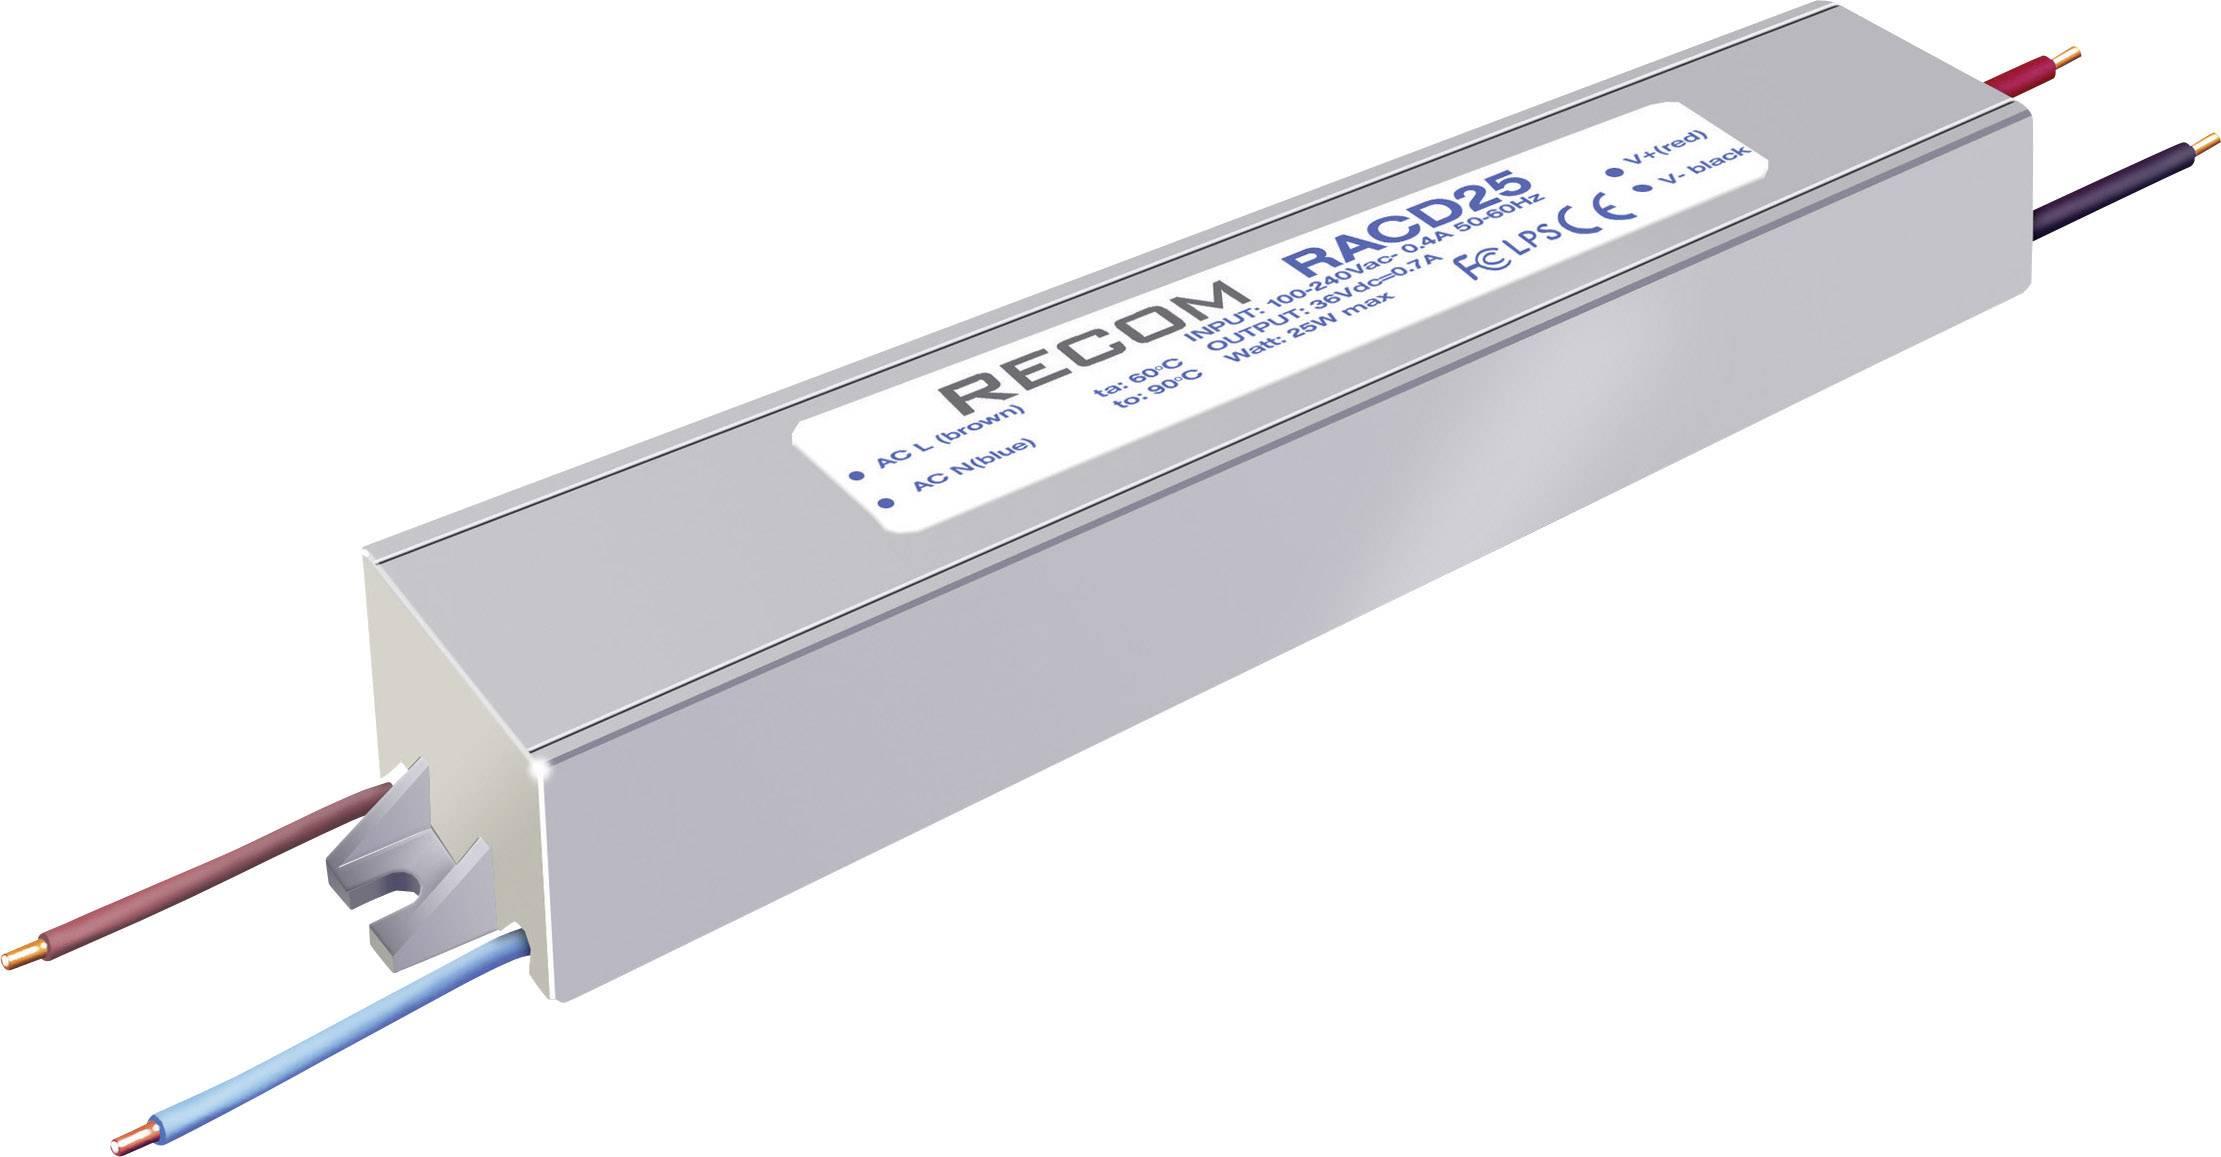 LED driver Recom Lighting RACD25-500P, 25 W (max), 0.52 A, 42 - 52 V/DC